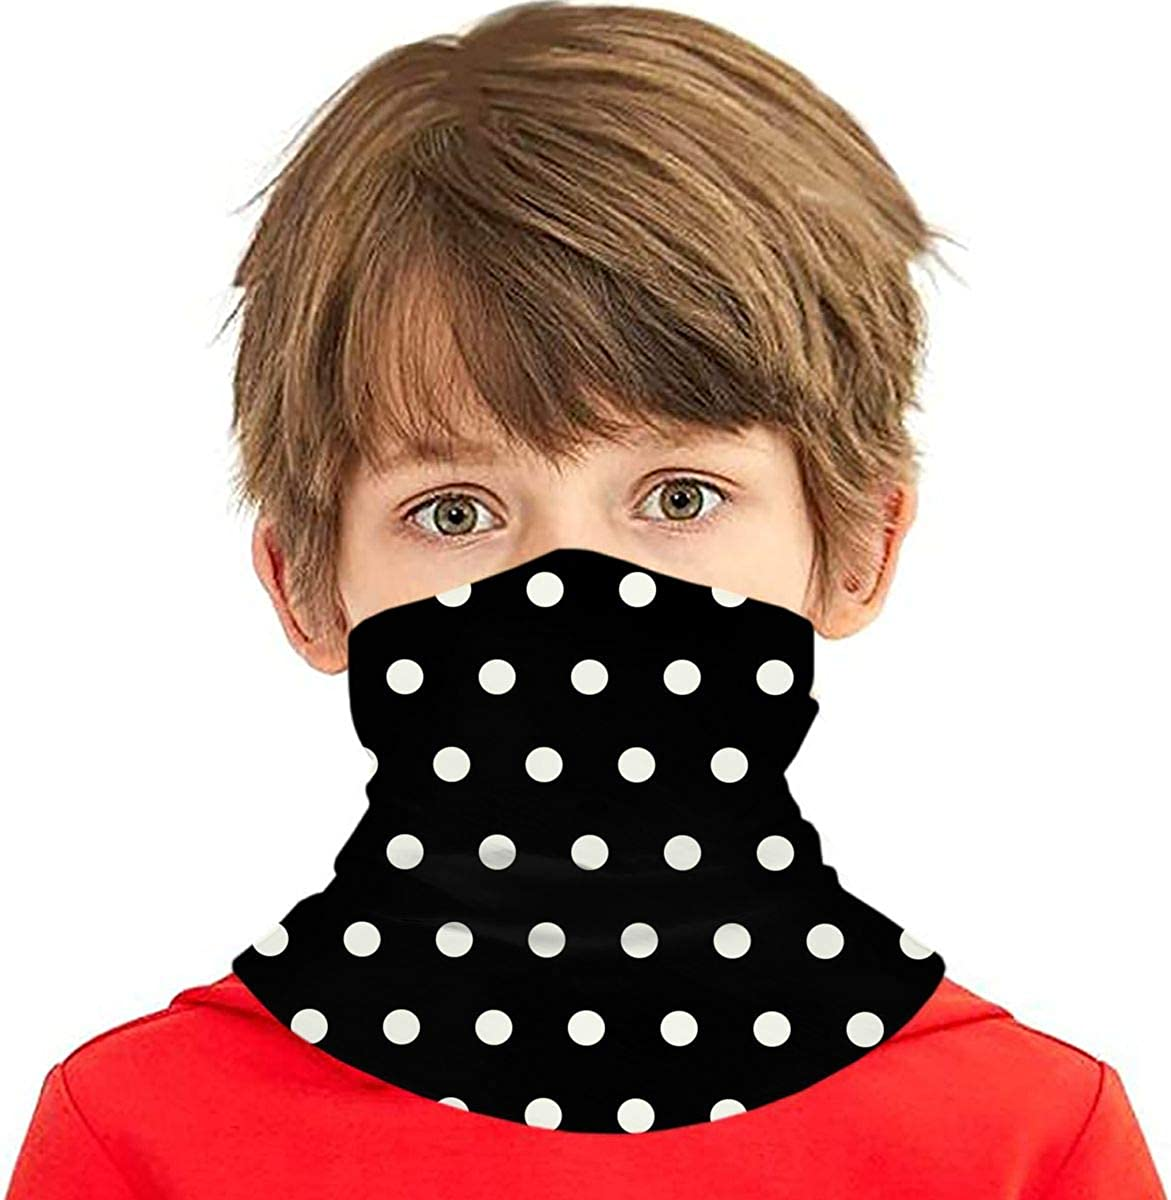 Dujiea Kids Bandanas Face Mask, Black And White Dots Dust Sun UV Protection Neck Gaiter Multifunctional Balaclava Face Scarf Summer Tube Headband Lightweight for Boys Girls Outdoors